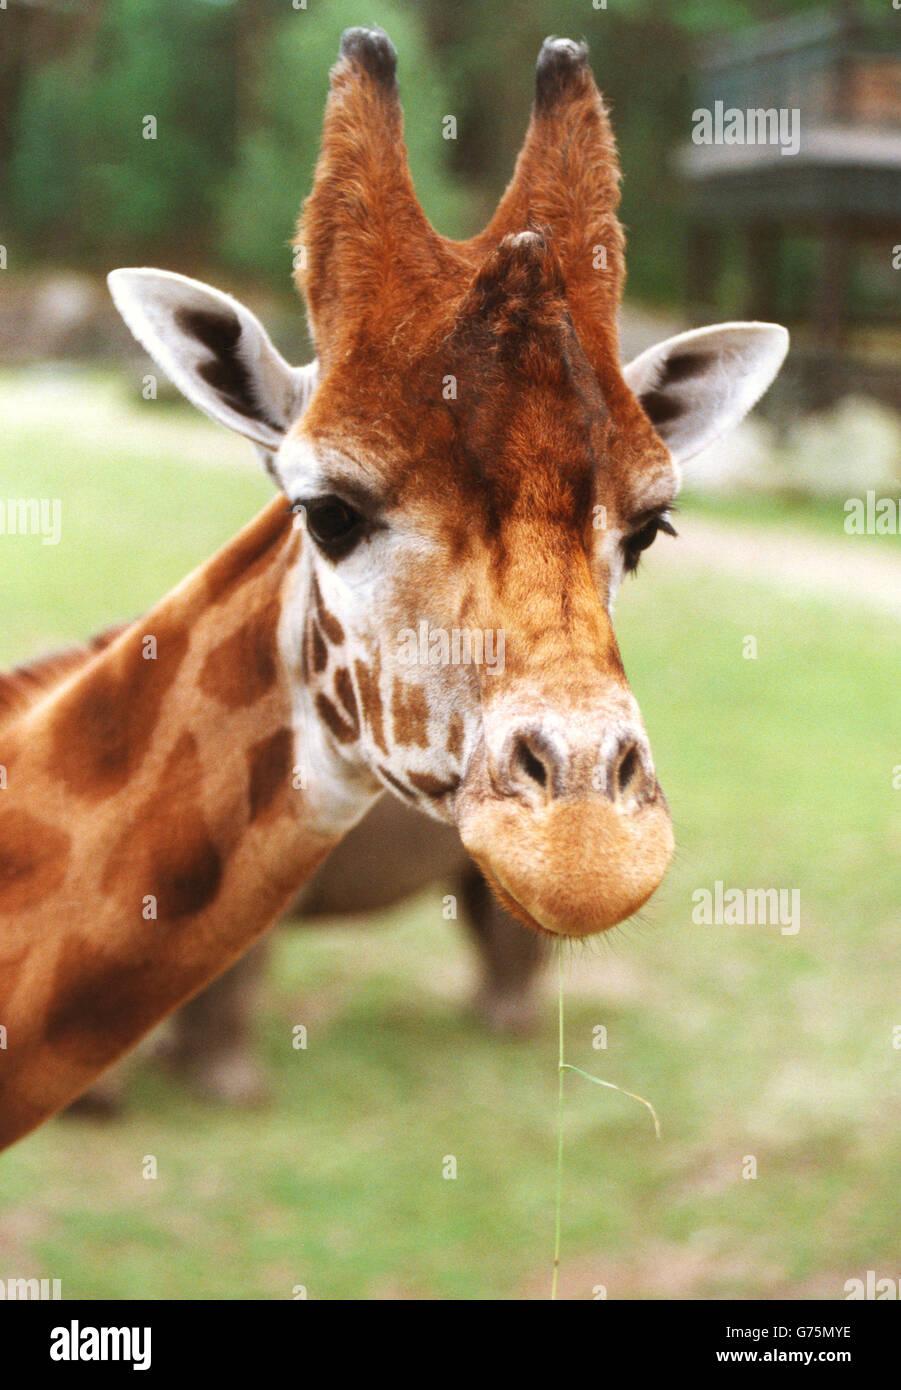 Jirafa en el Zoo. Imagen De Stock